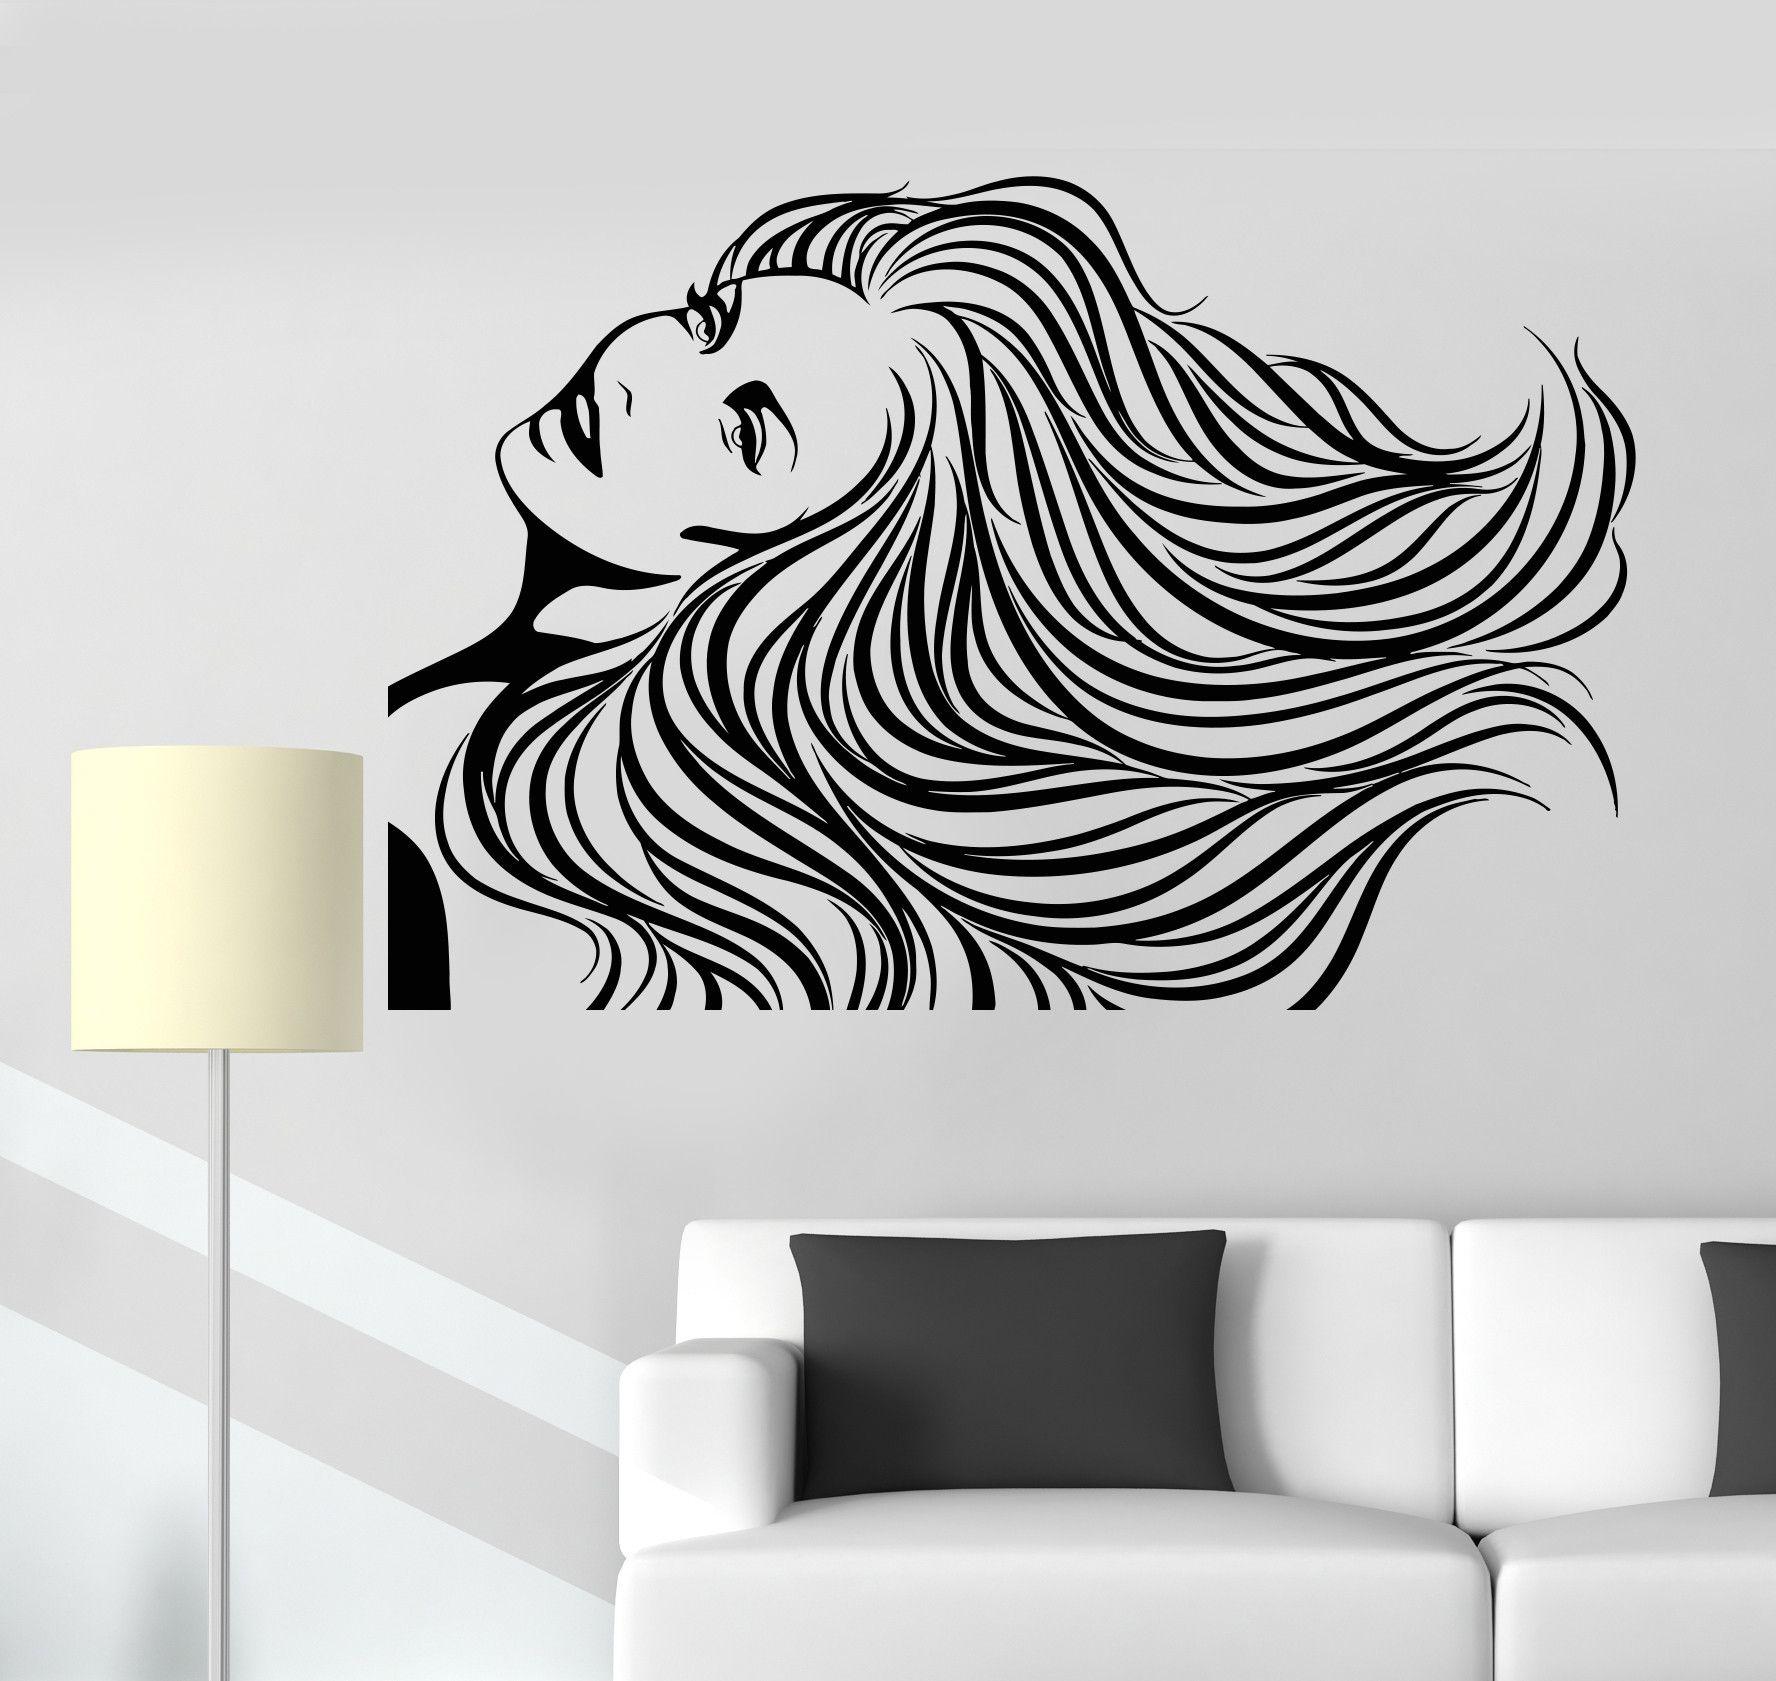 Vinyl Wall Decal Beauty Salon Long Hair Woman Spa Barbershop Stickers (ig2936)